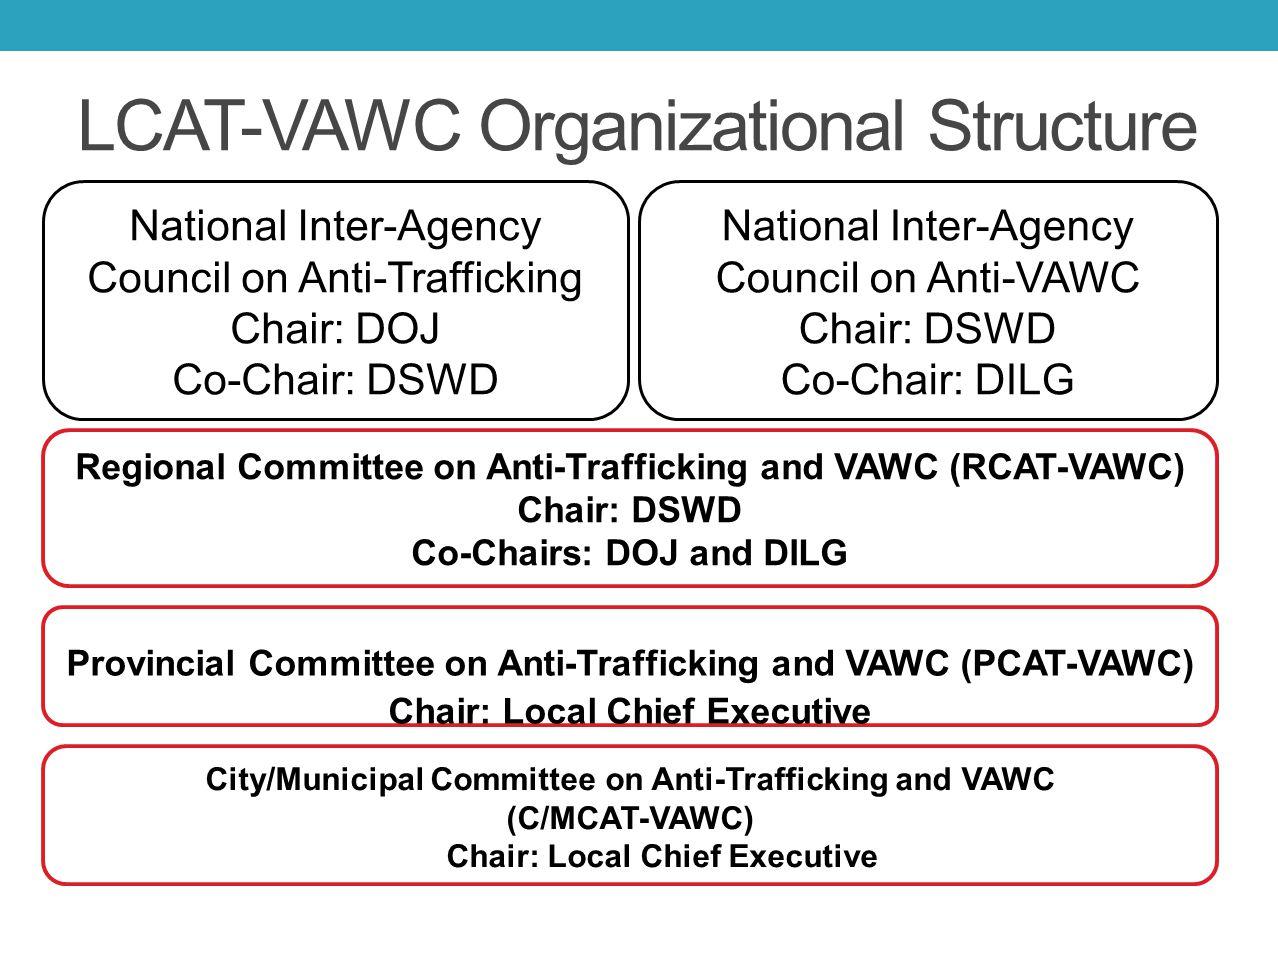 LCAT-VAWC Organizational Structure National Inter-Agency Council on Anti-Trafficking Chair: DOJ Co-Chair: DSWD National Inter-Agency Council on Anti-V